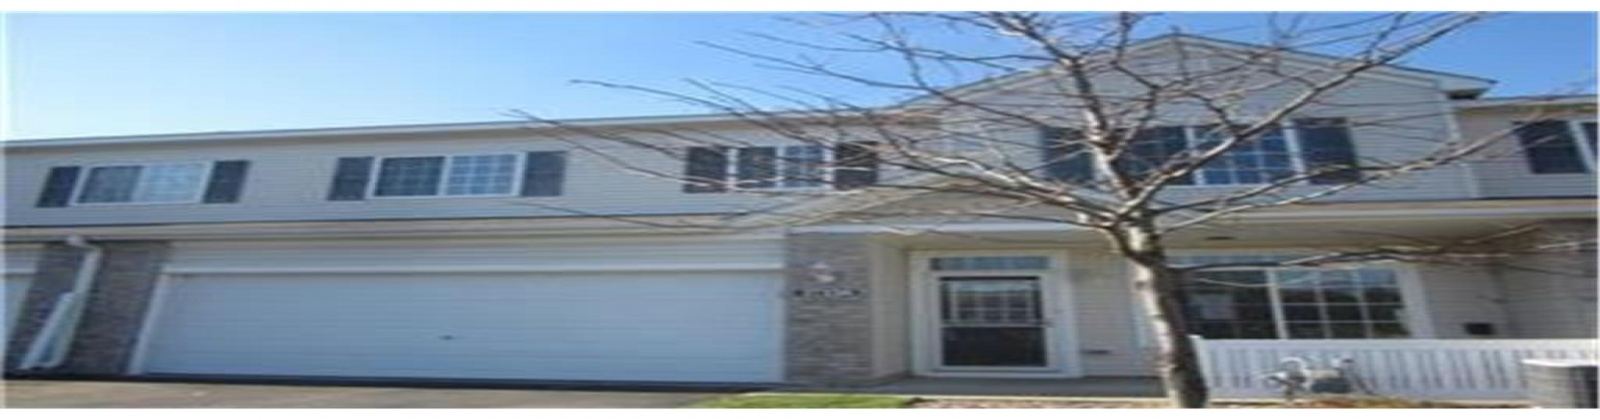 17138 Olson Street NW NW, Elk River, Minnesota 55330, ,Townhouse,Pending,Olson Street NW,1003